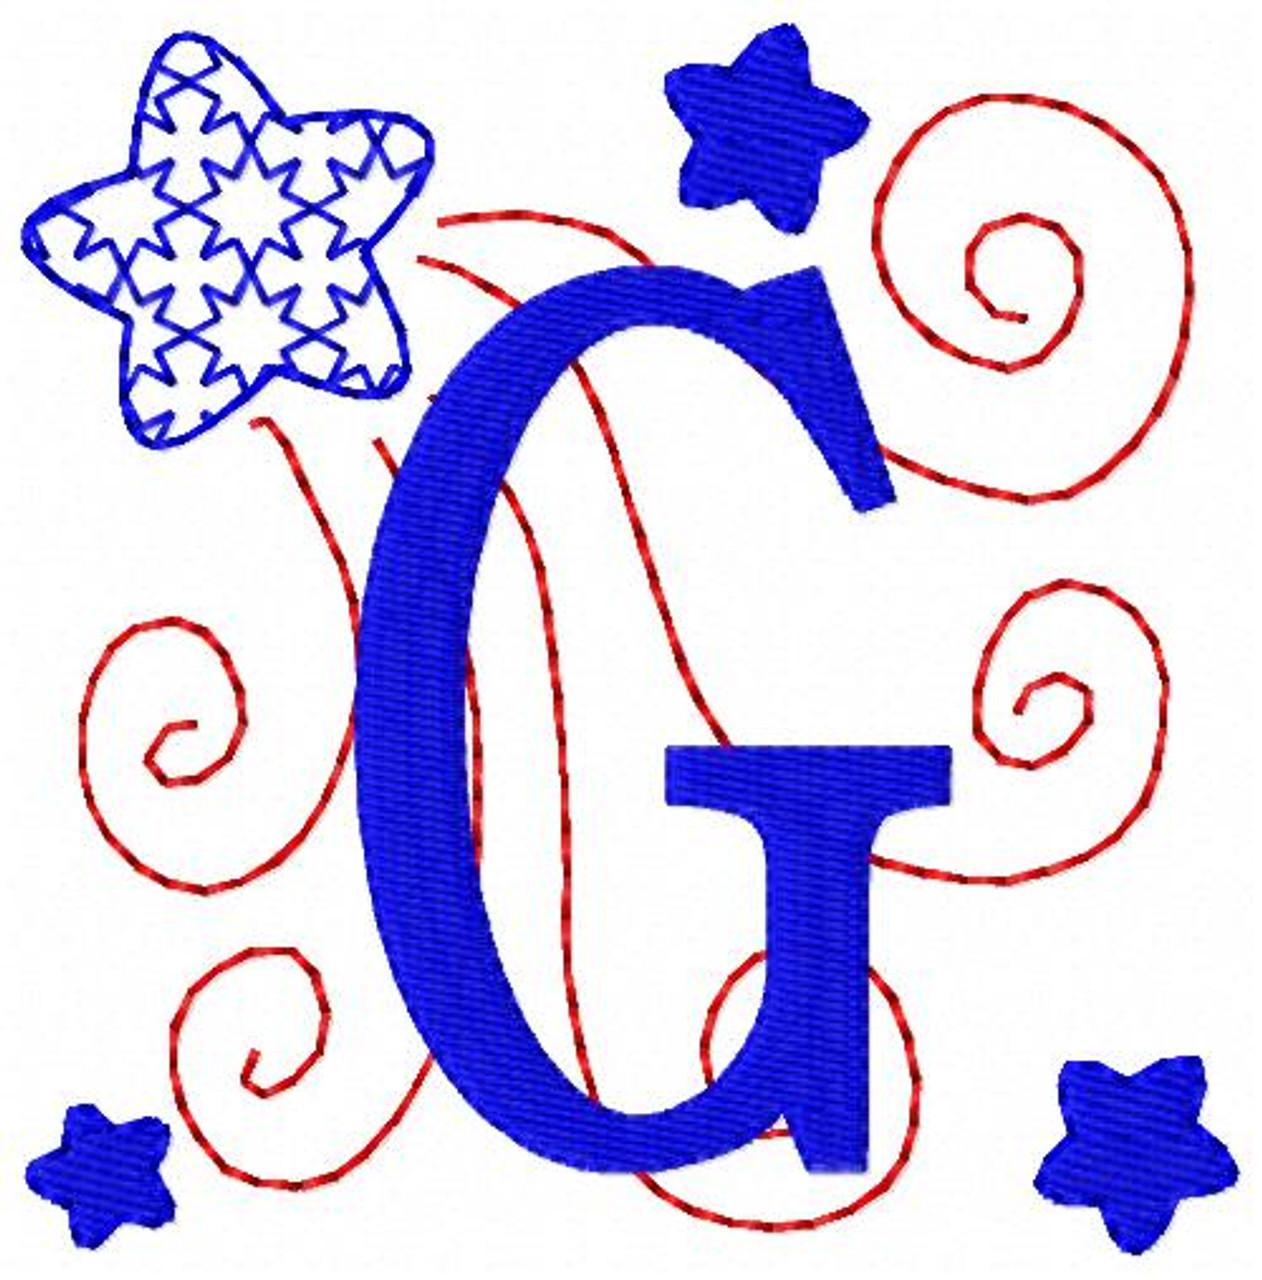 Patriotic Star Monogram Set Joyful Stitches